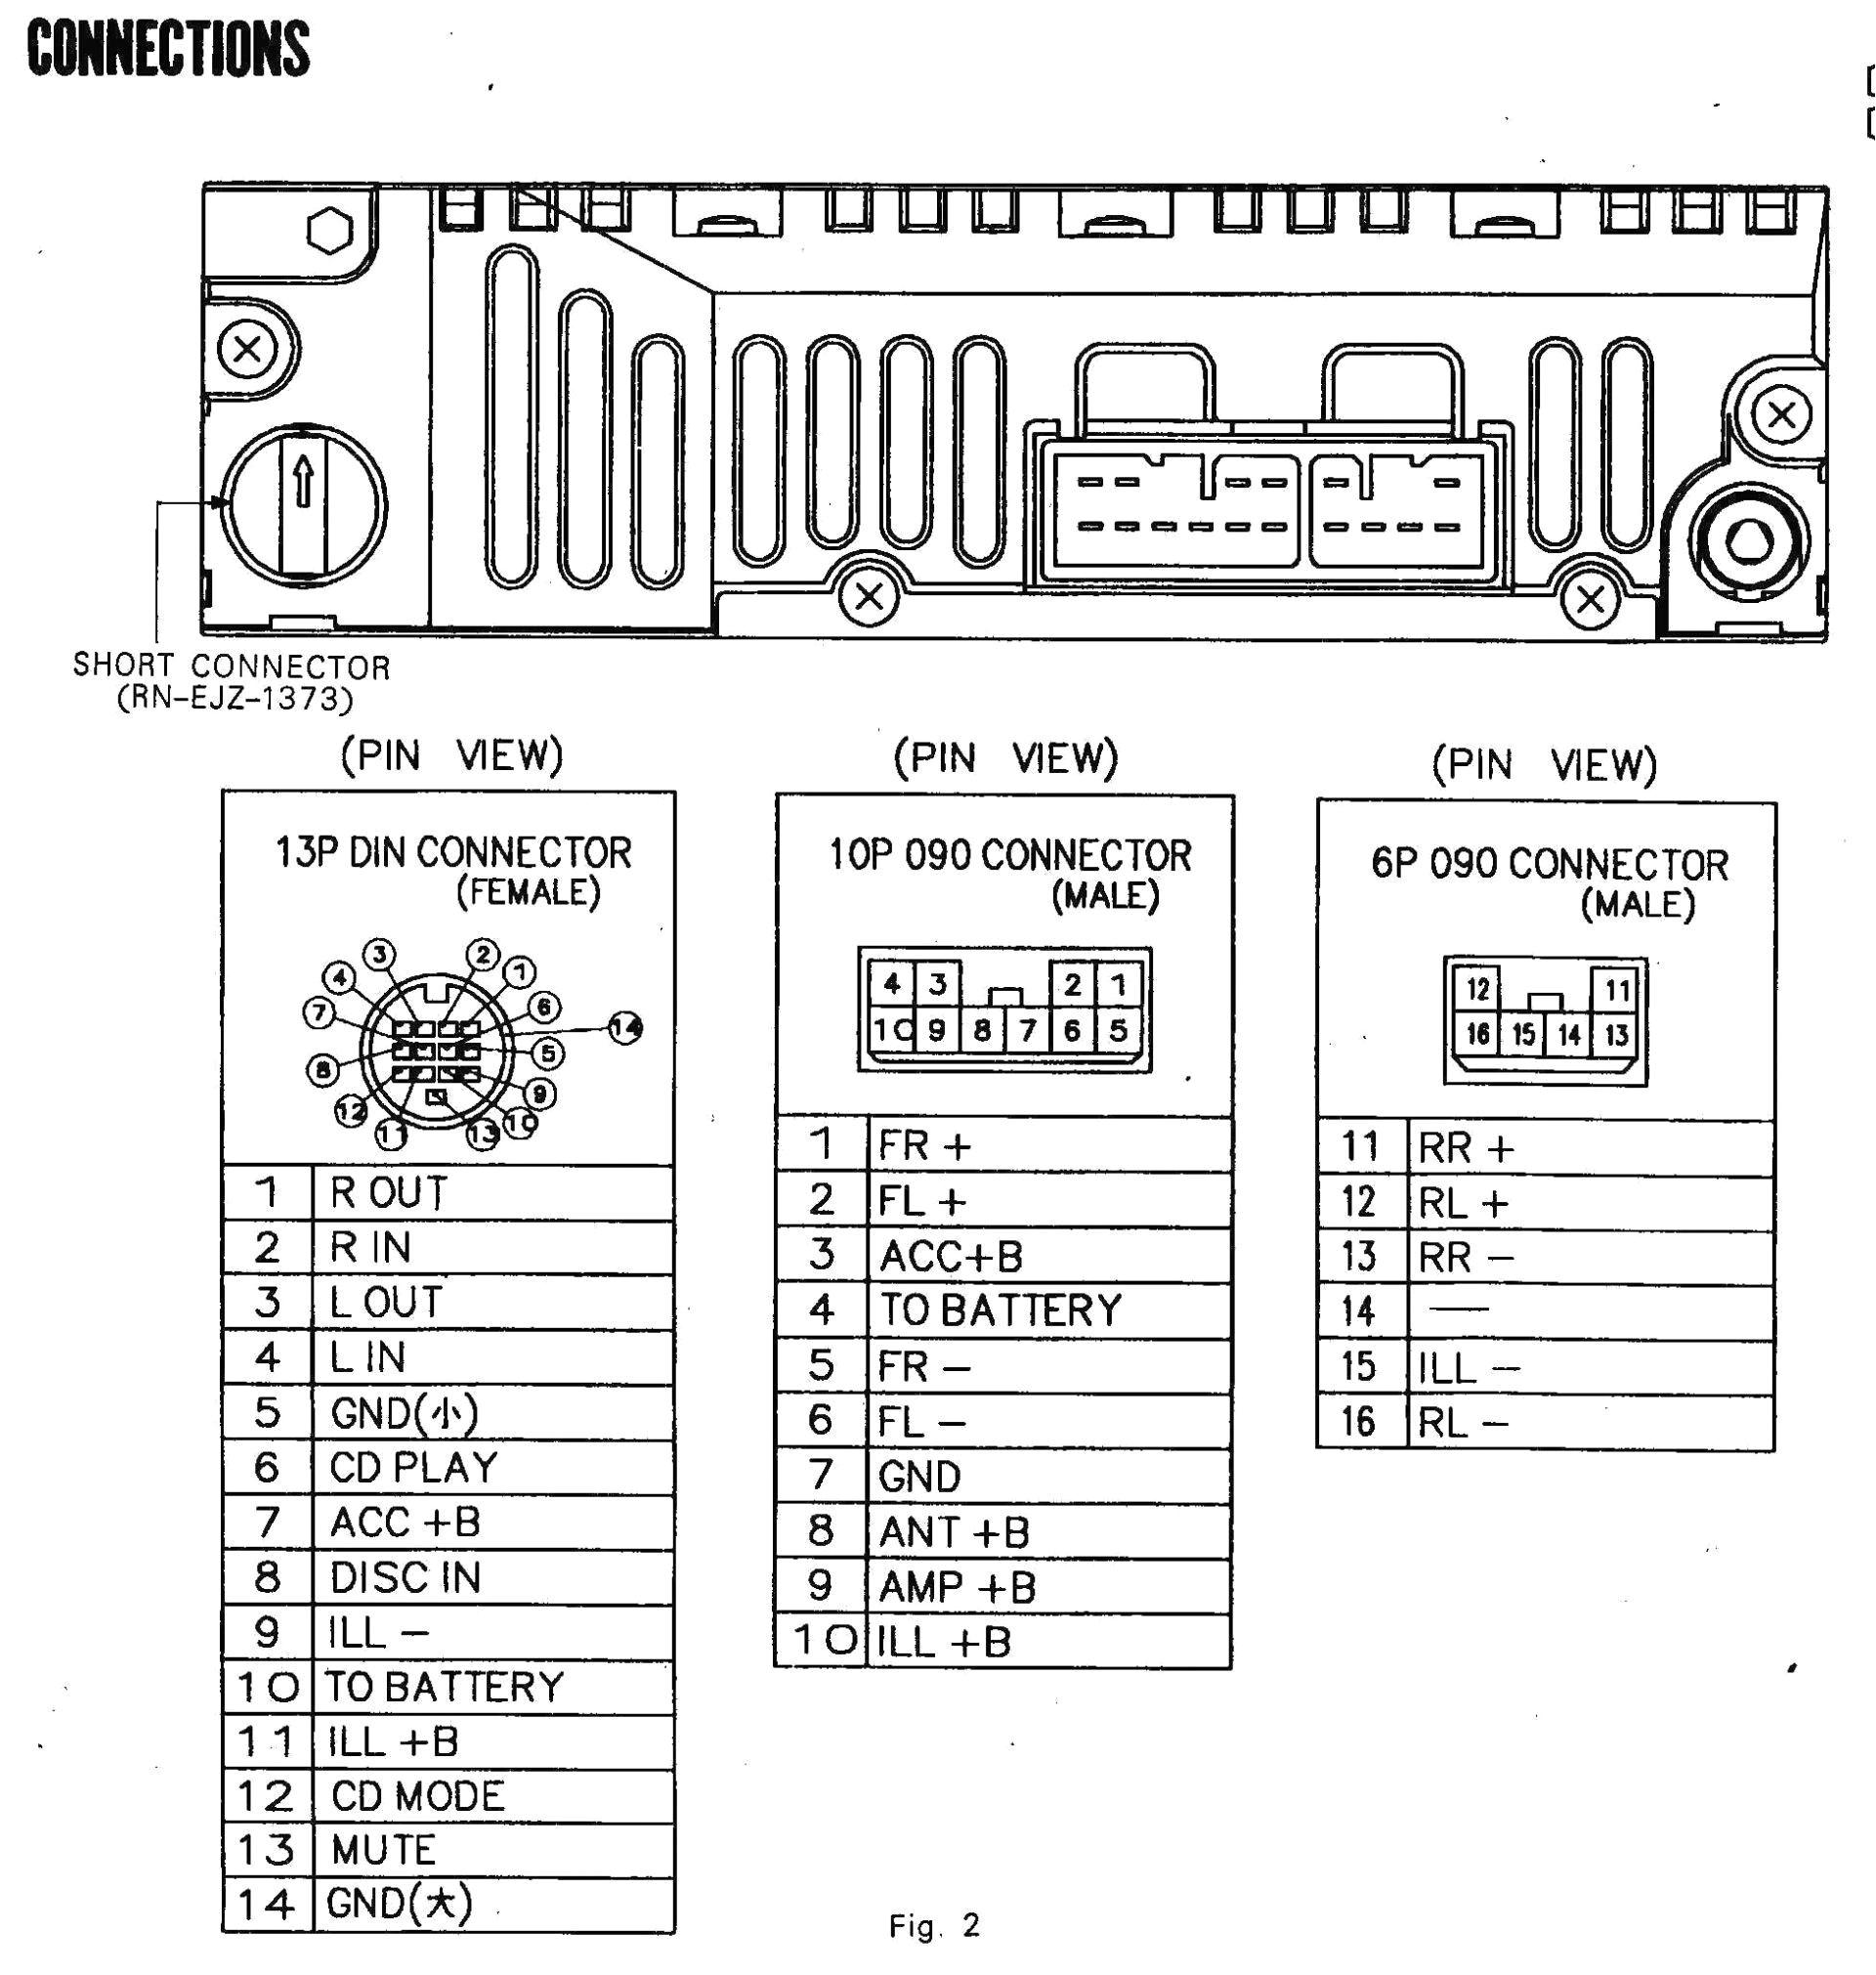 kenwood ddx319 wiring diagram manual e book kenwood ddx419 wiring diagram